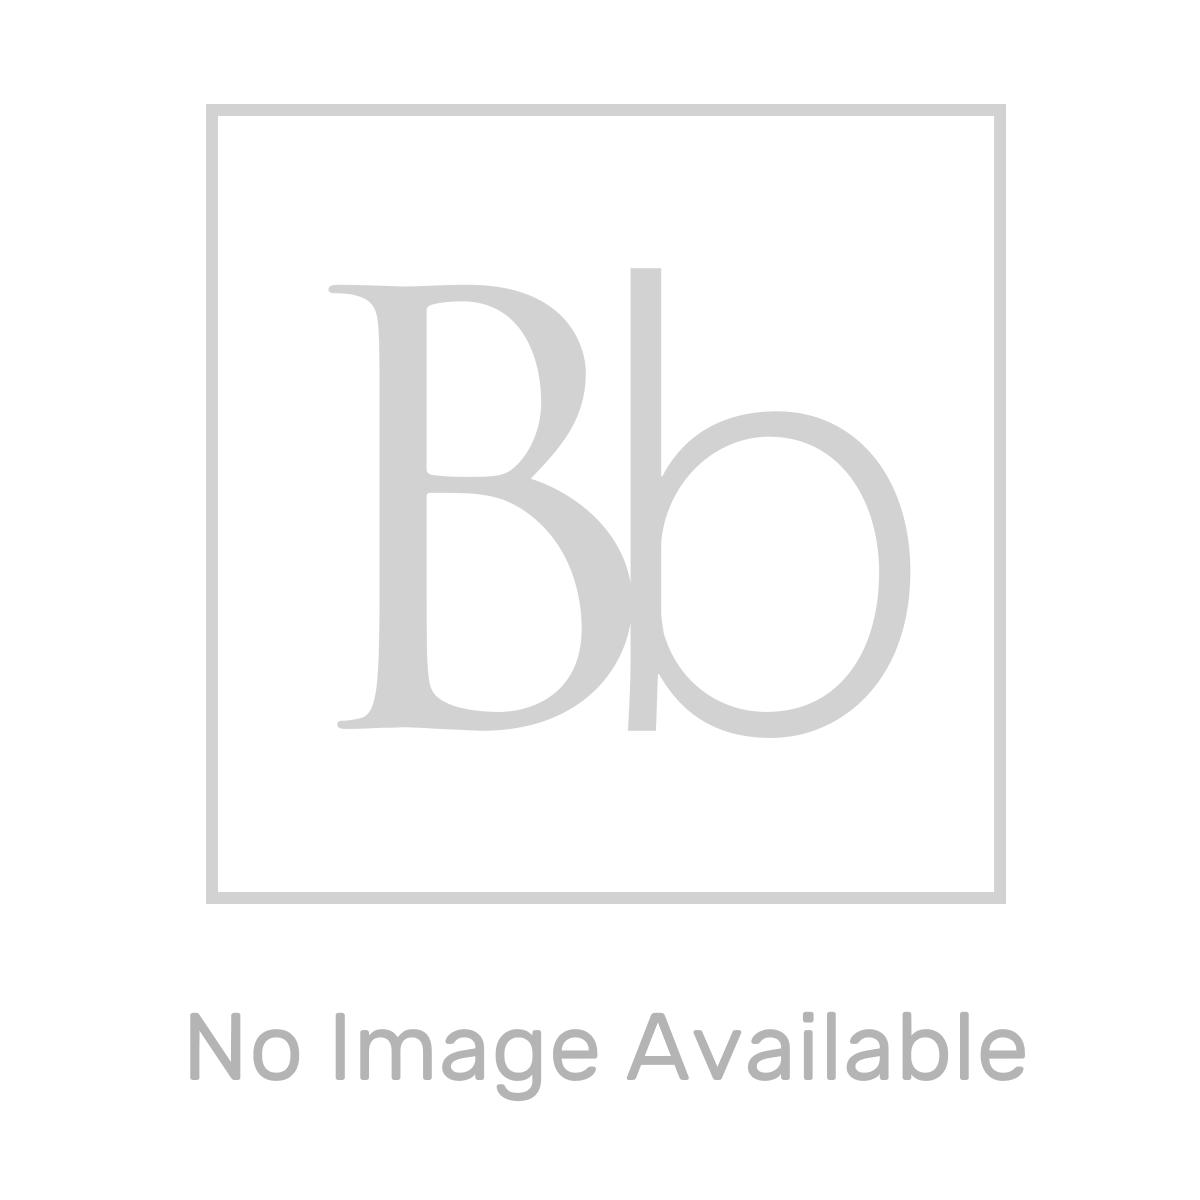 Croydex Stainless Steel Stretch Shower Hose